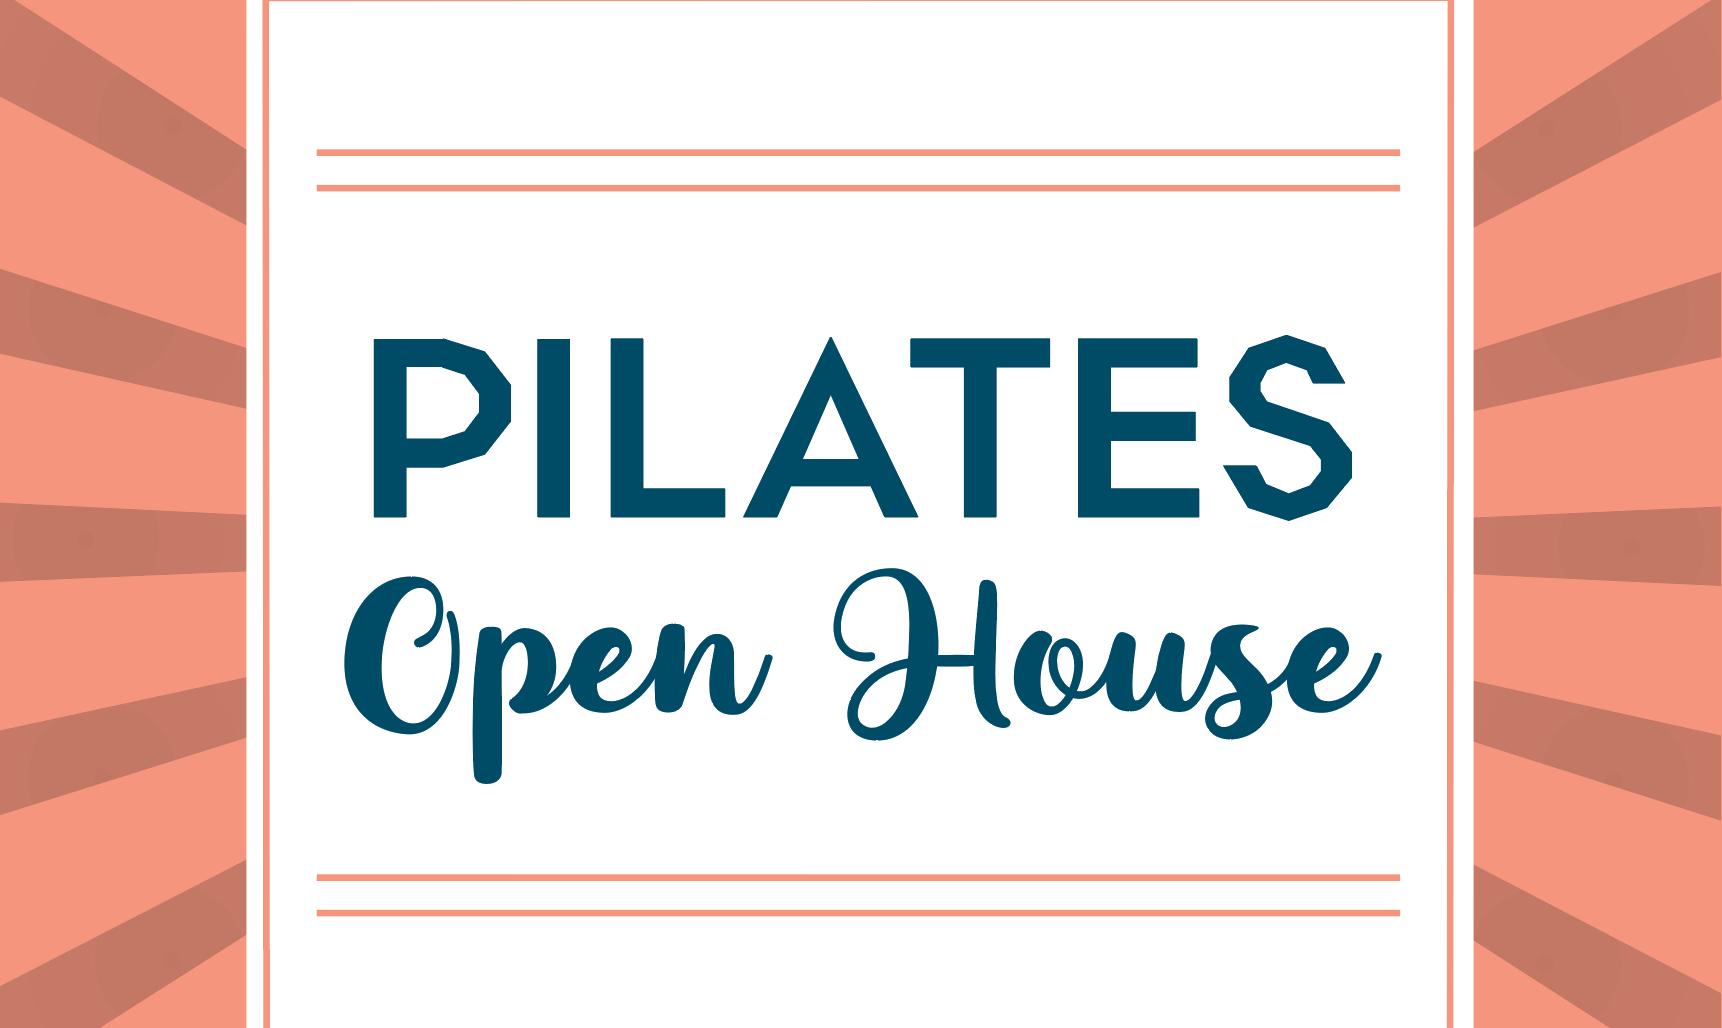 Pilates Open House Castle Hill Fitness 360